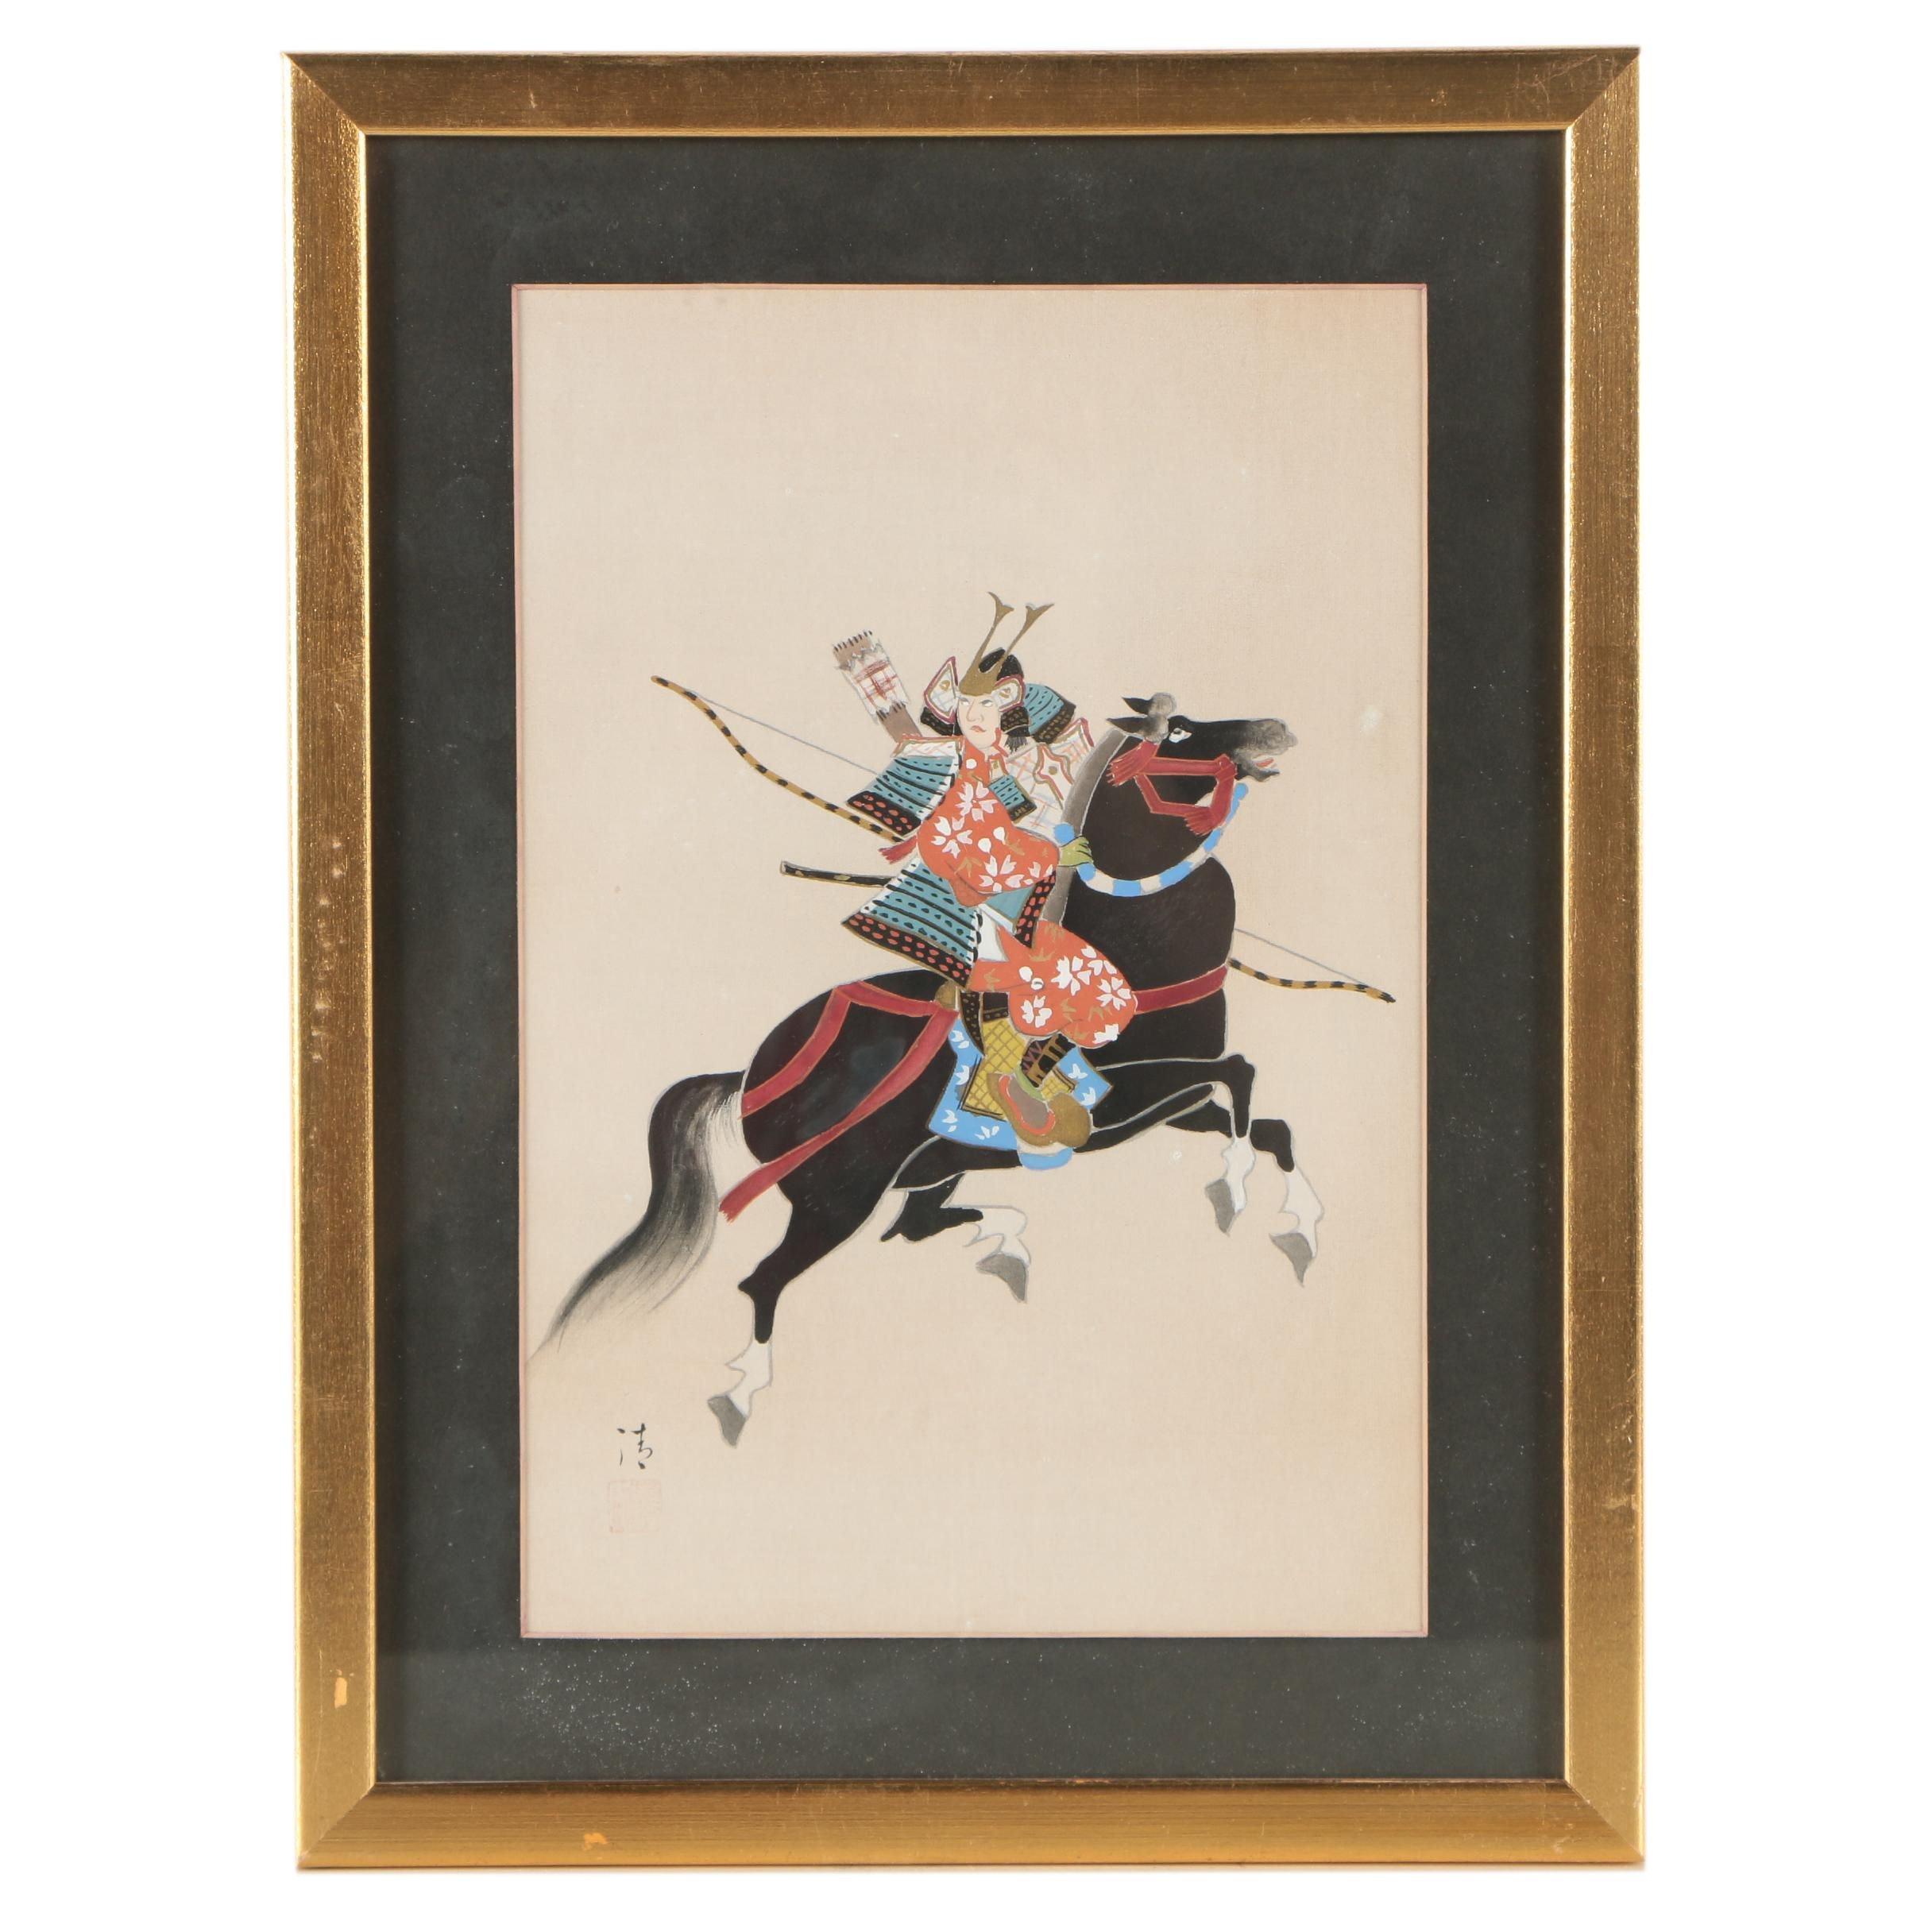 Japanese Gouache Painting of a Samurai Warrior on Horseback